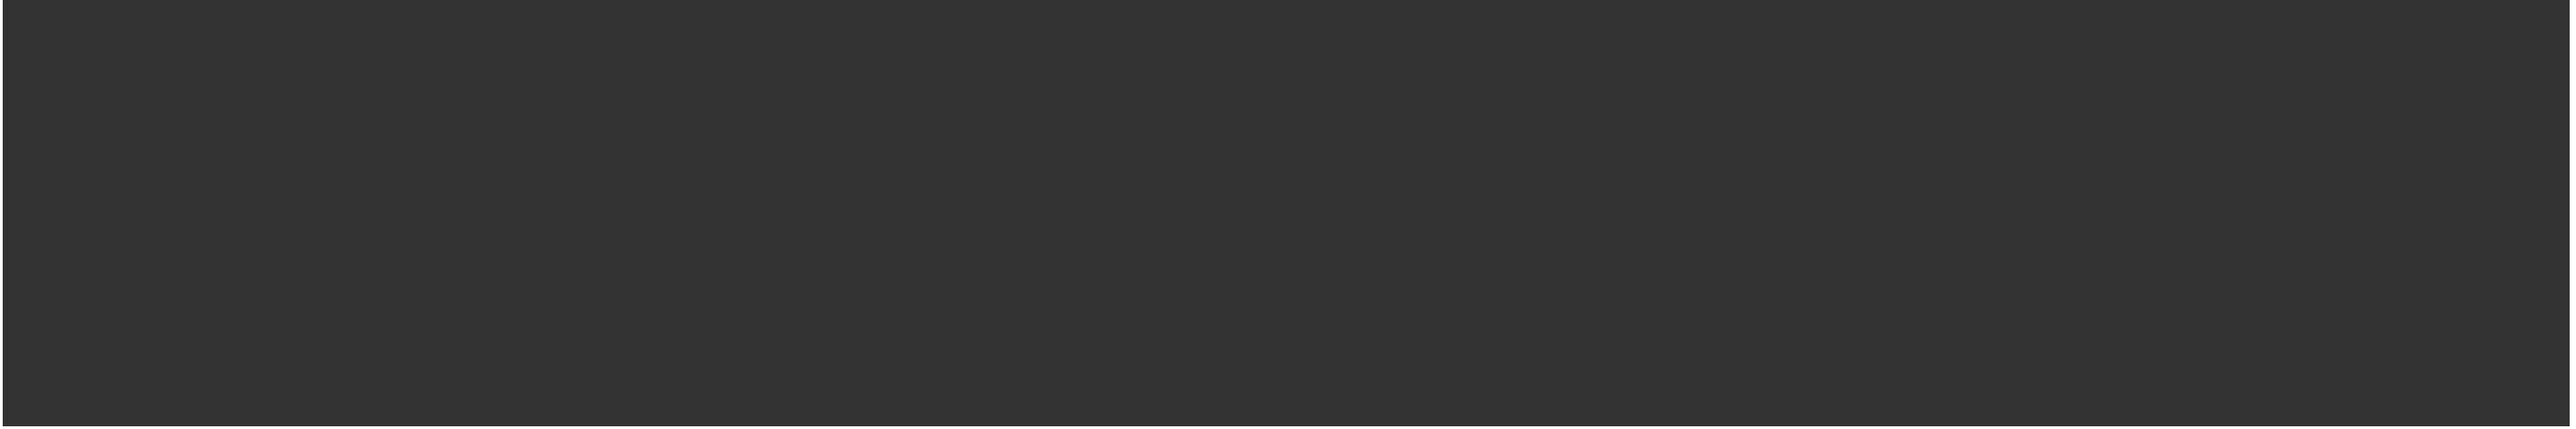 Credit Alert Logo